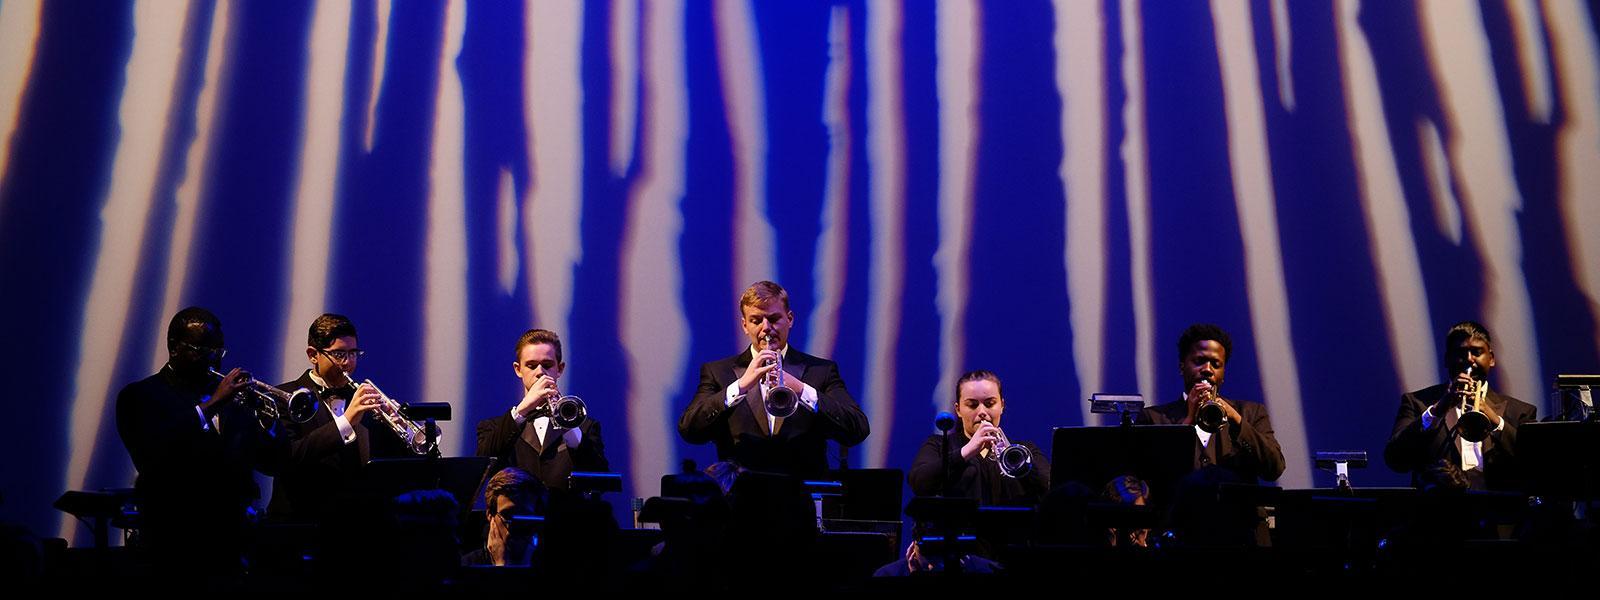 Collage Concert / Photo: Ken Bennett